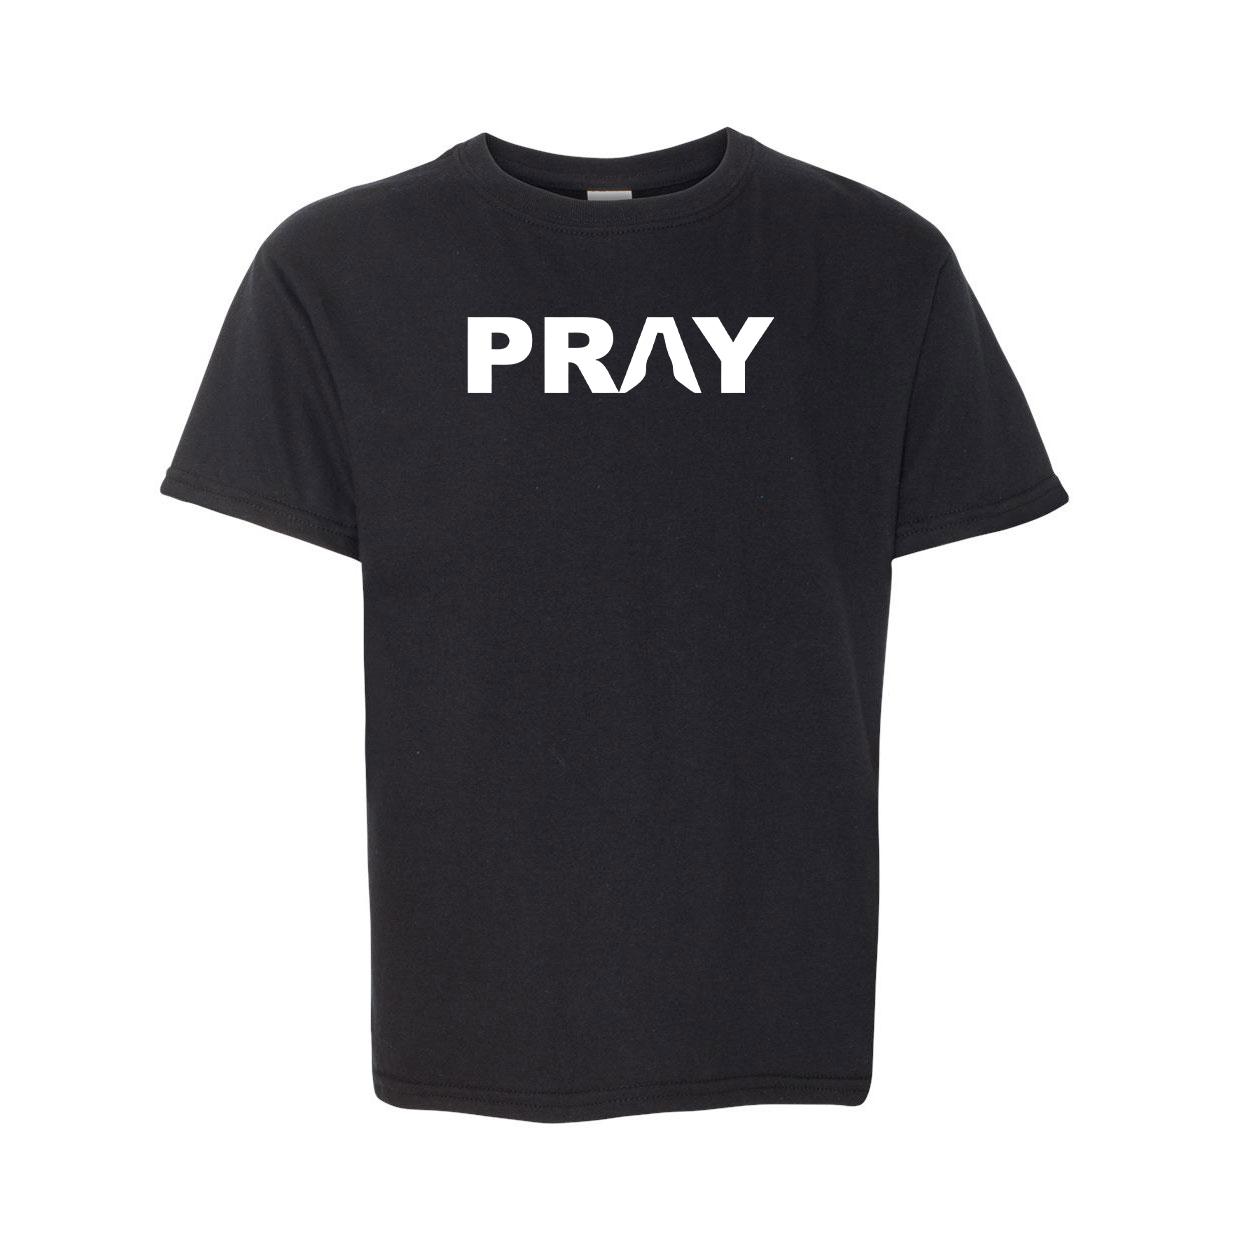 Pray Hands Logo Classic Youth T-Shirt Black (White Logo)